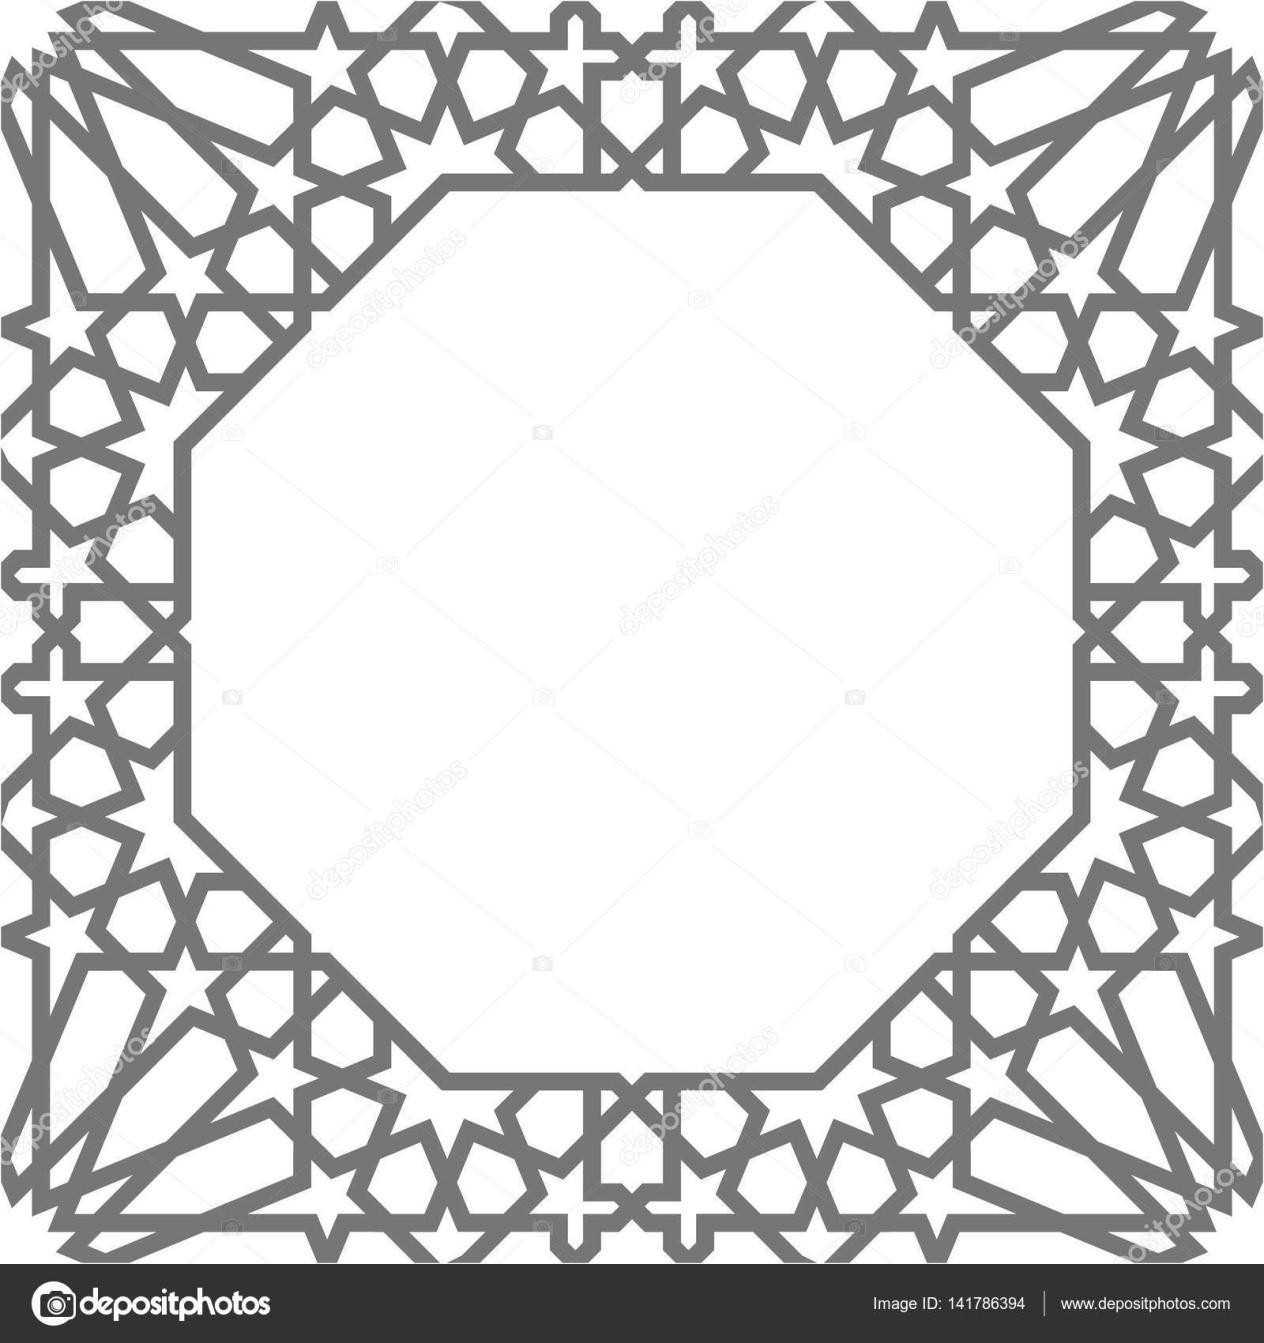 1264x1343 On Traditional Arabic Art Rhdepositphotoscom Islamic Islamic